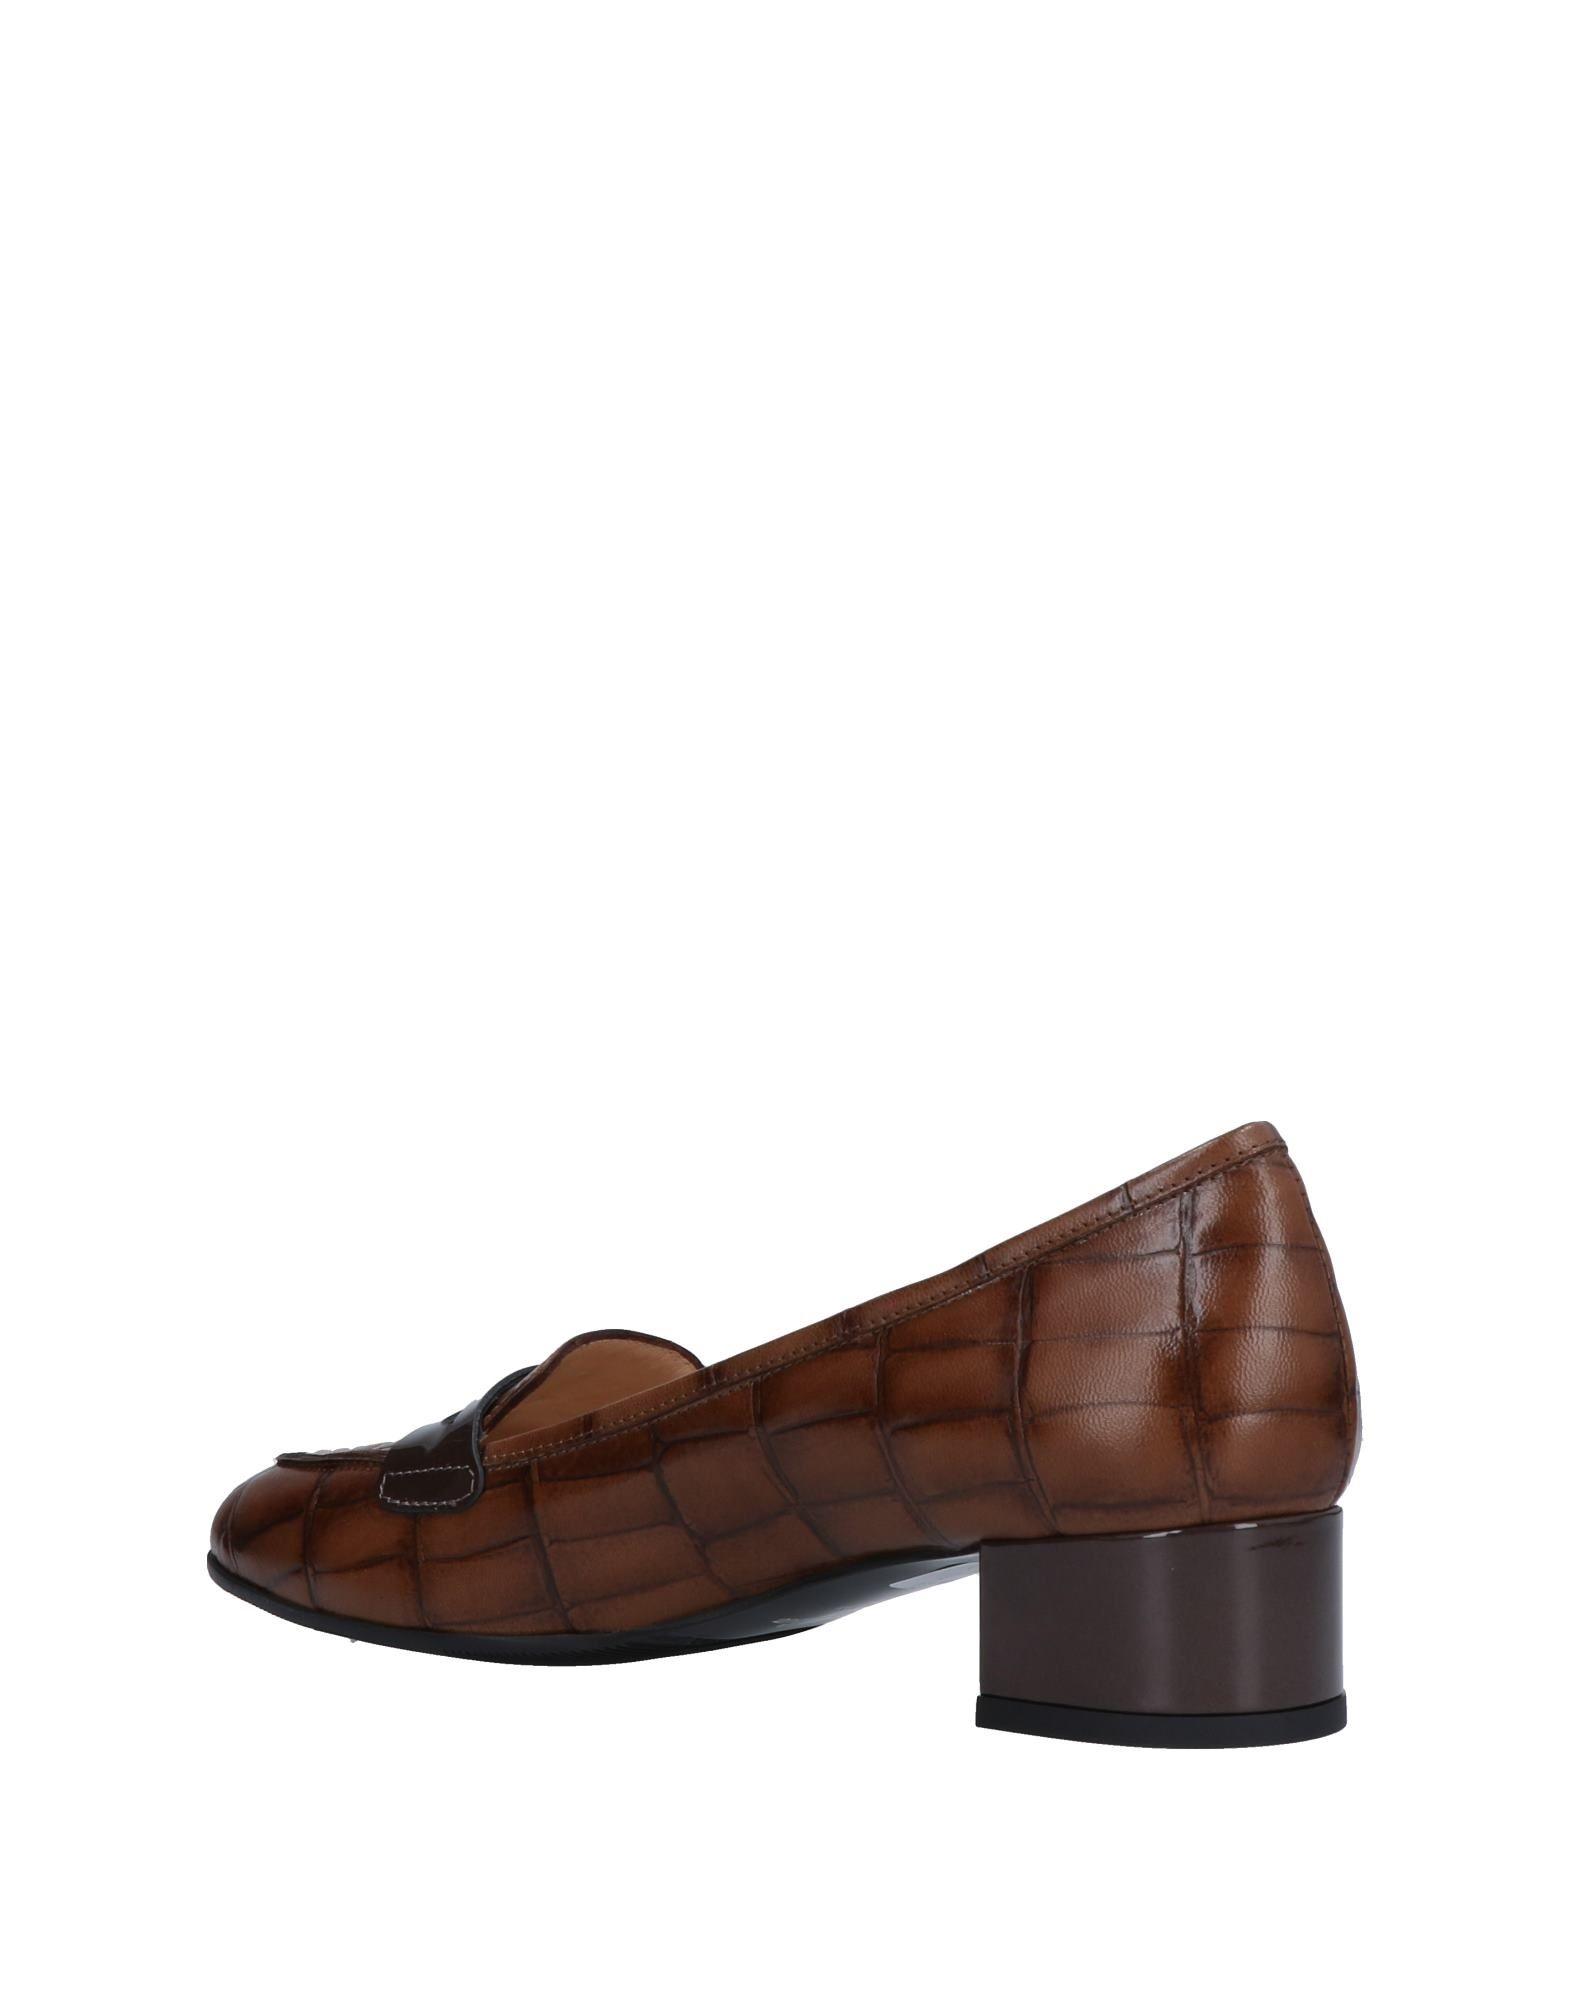 Stilvolle billige Schuhe Damen F.Lli Bruglia Mokassins Damen Schuhe  11518269DD fe74a1